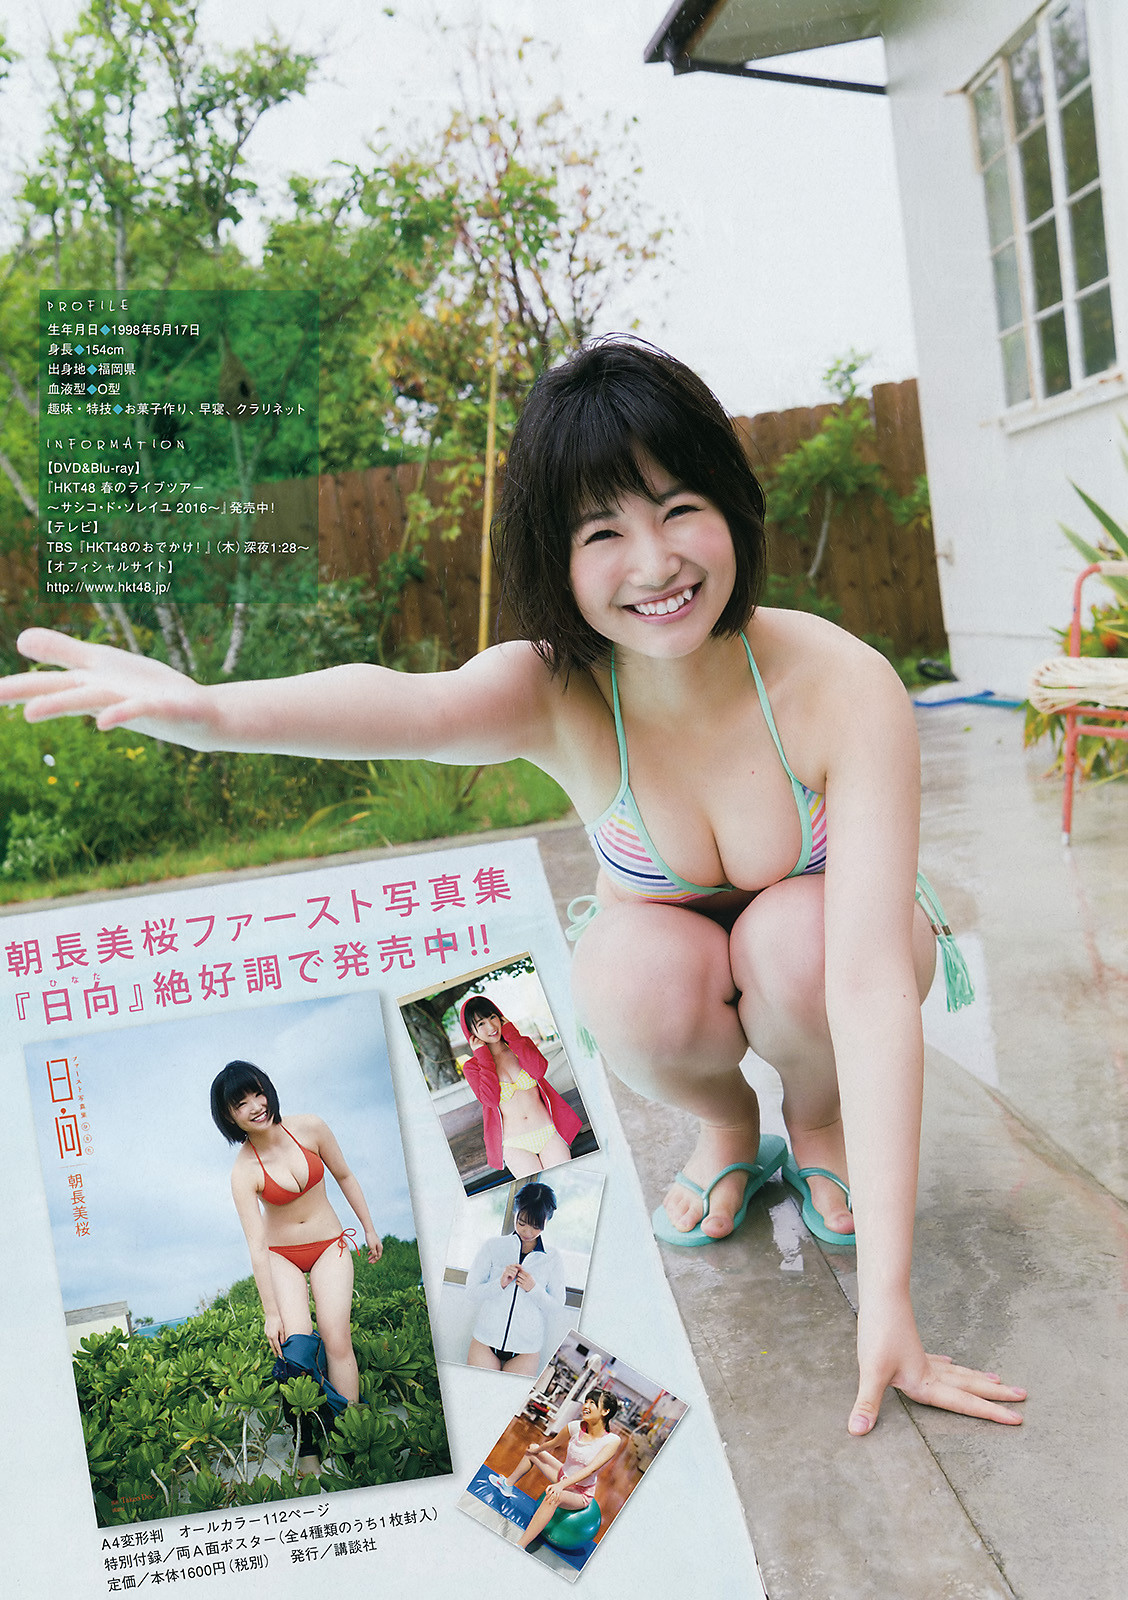 HKT48朝長美桜(19)の水着グラビア、キャバ嬢姿のエロ画像50枚・50枚目の画像